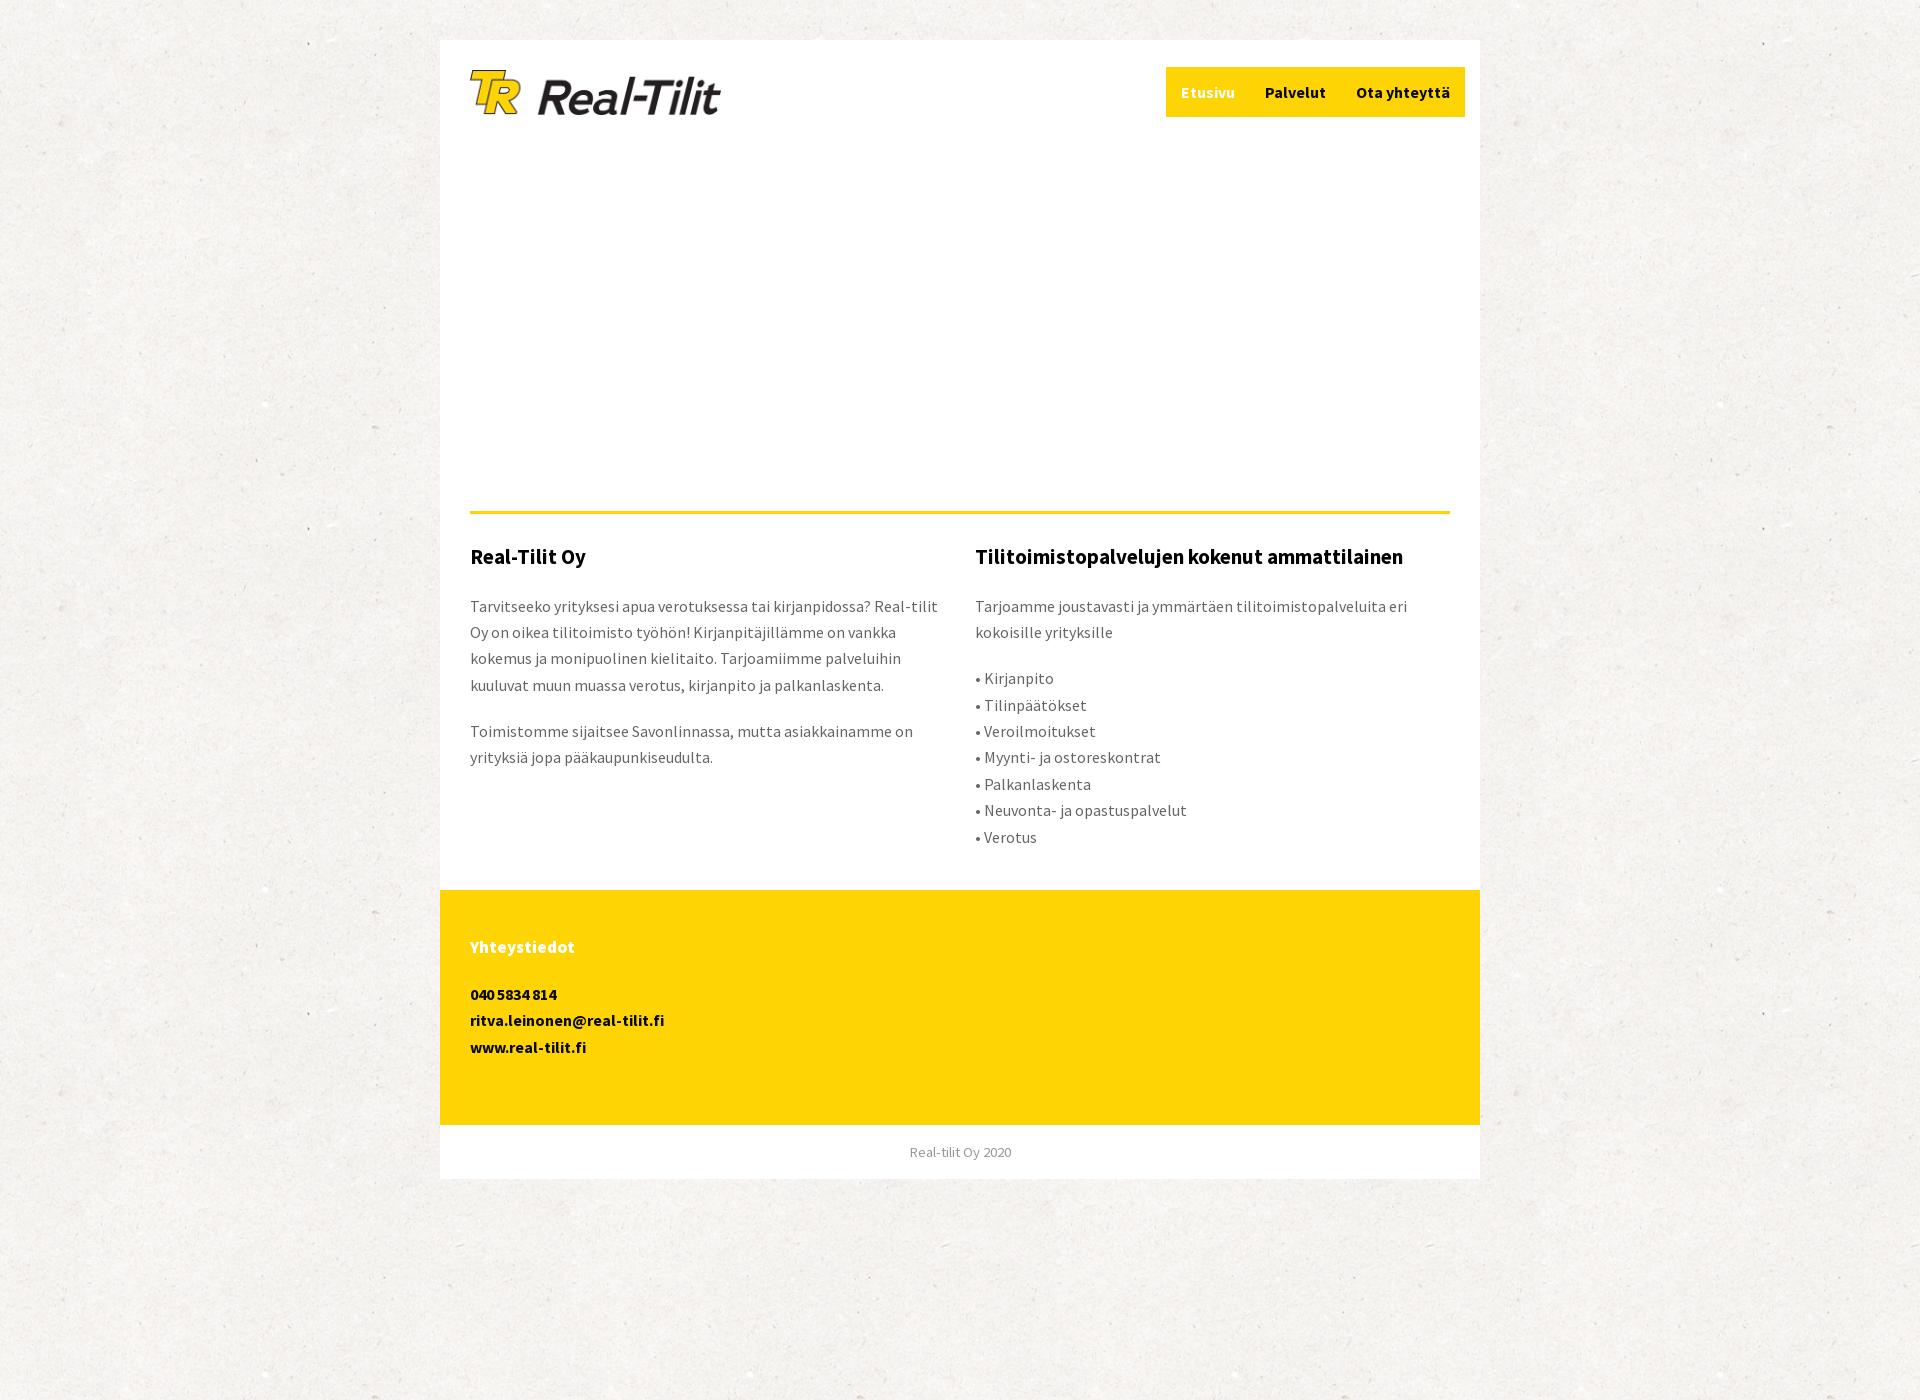 Screenshot for real-tilit.fi